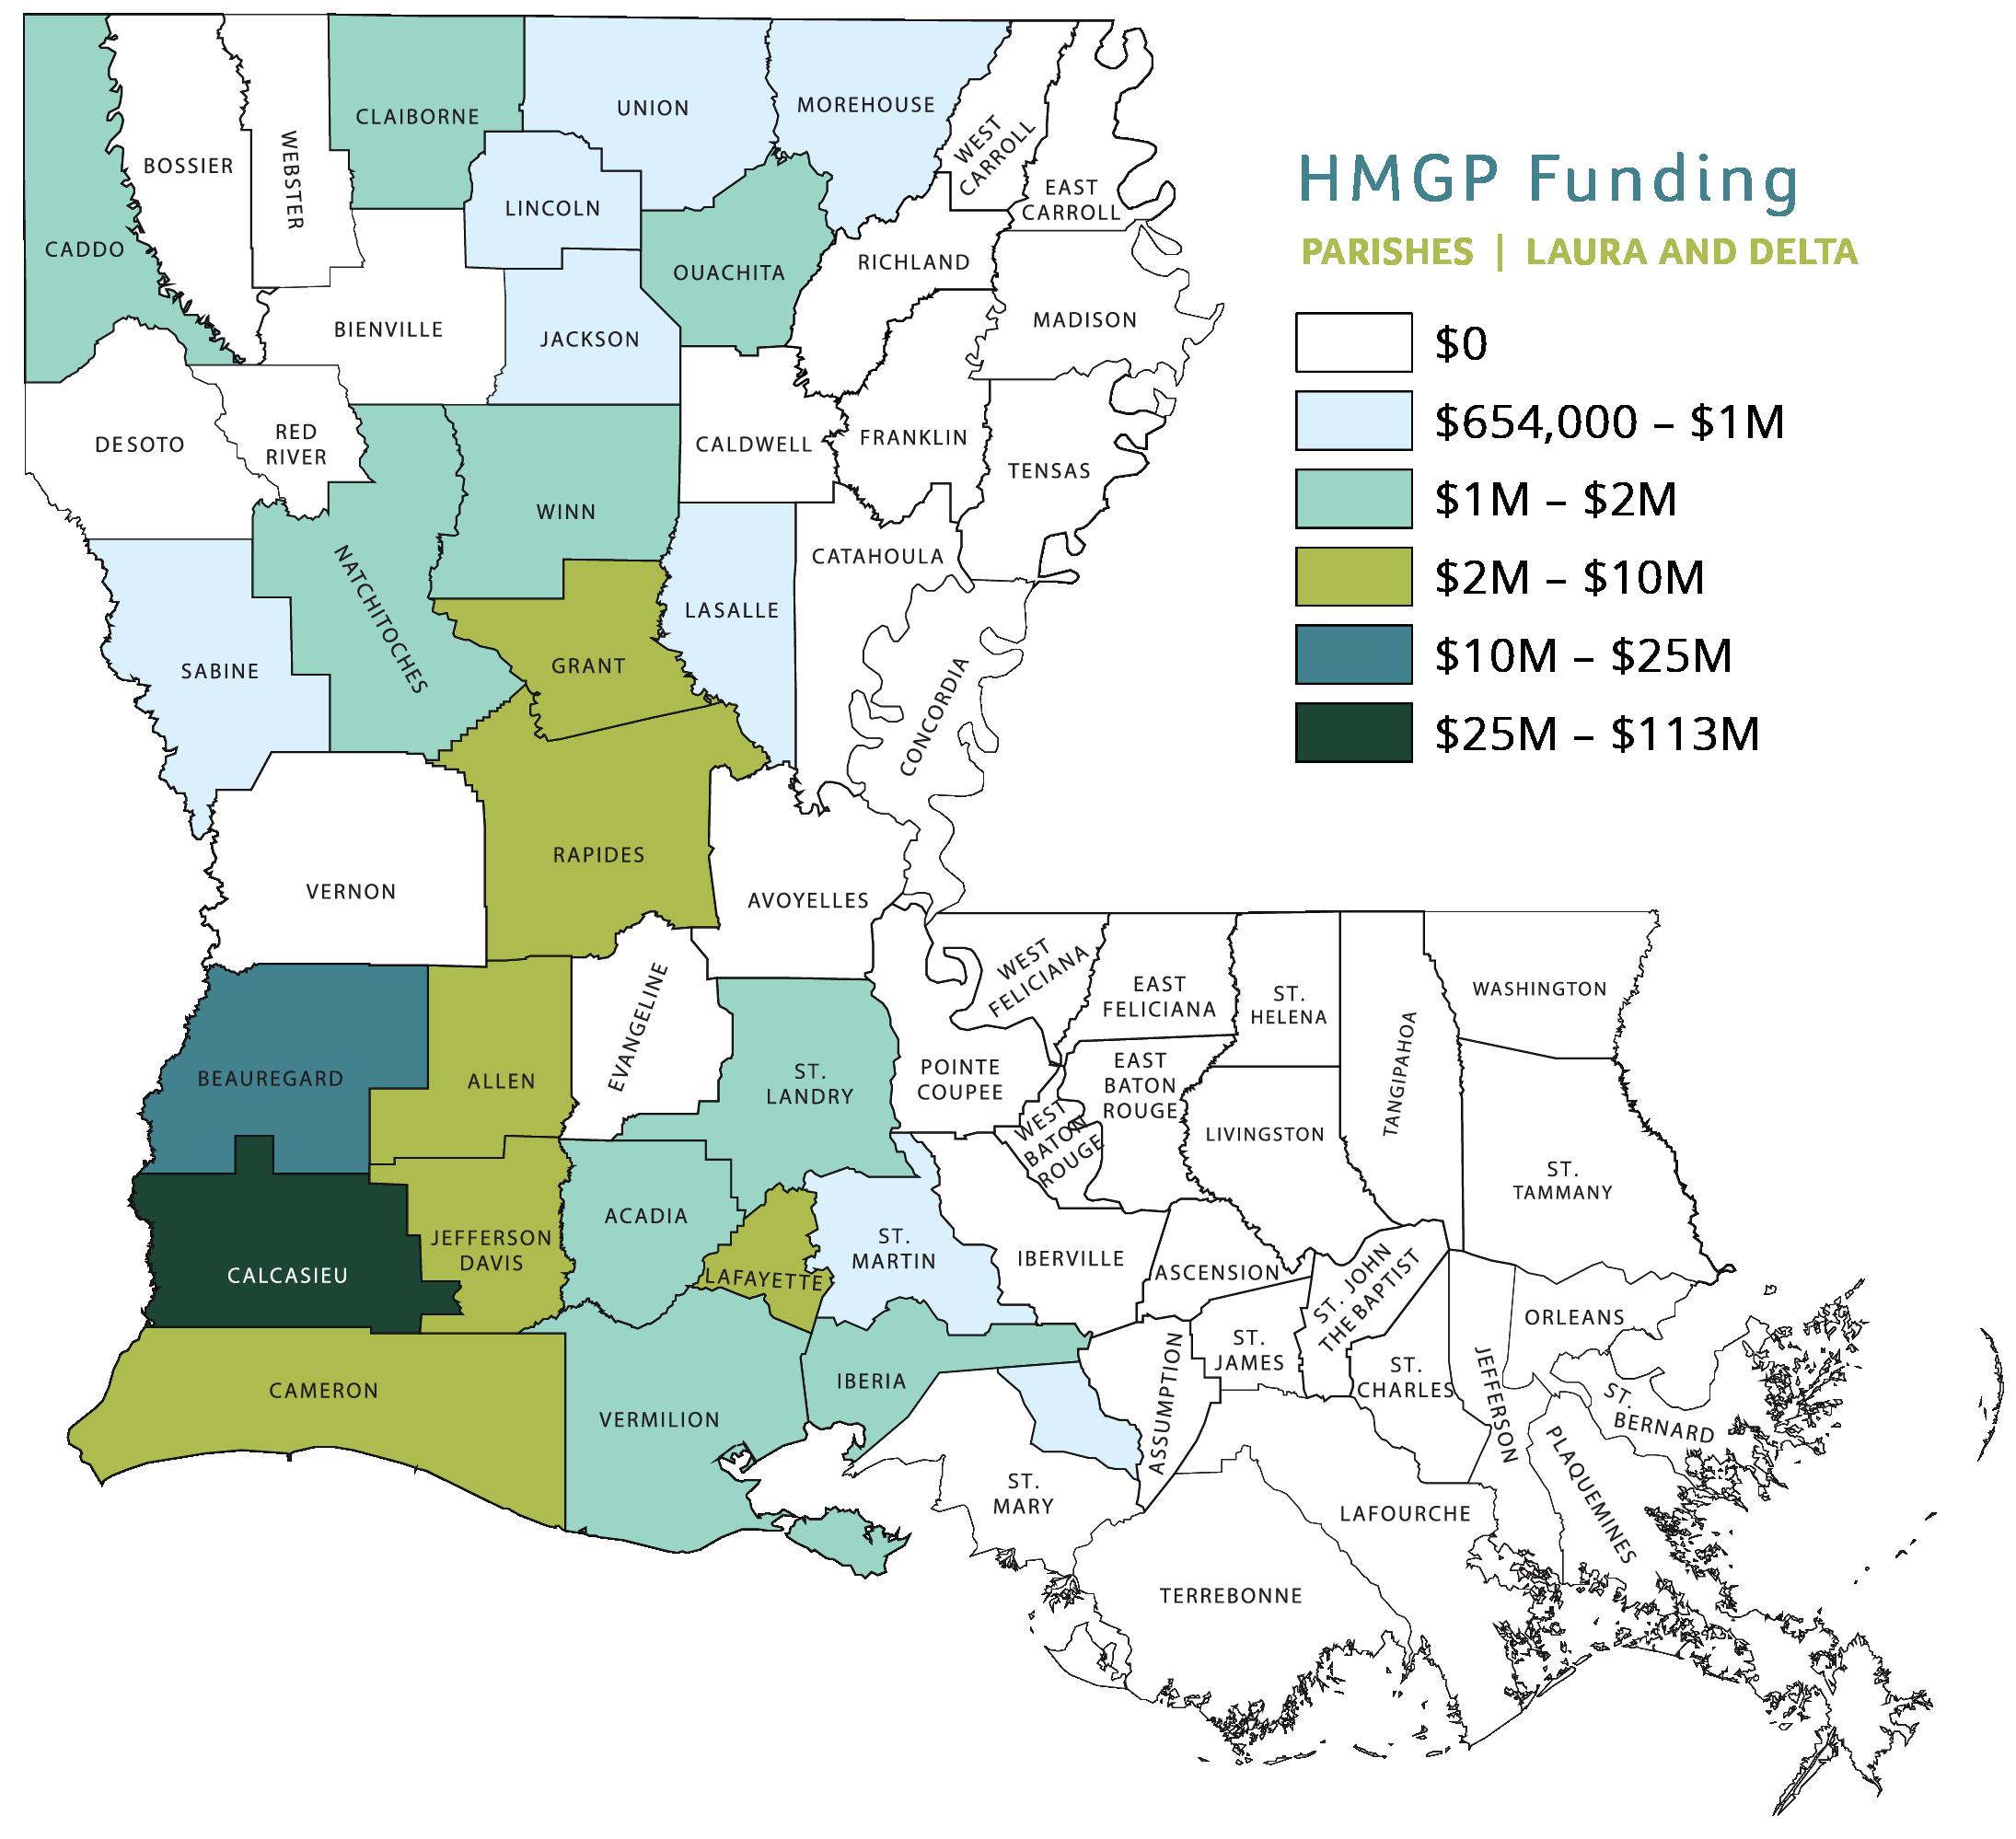 2020 Floods HMGP Funding Map